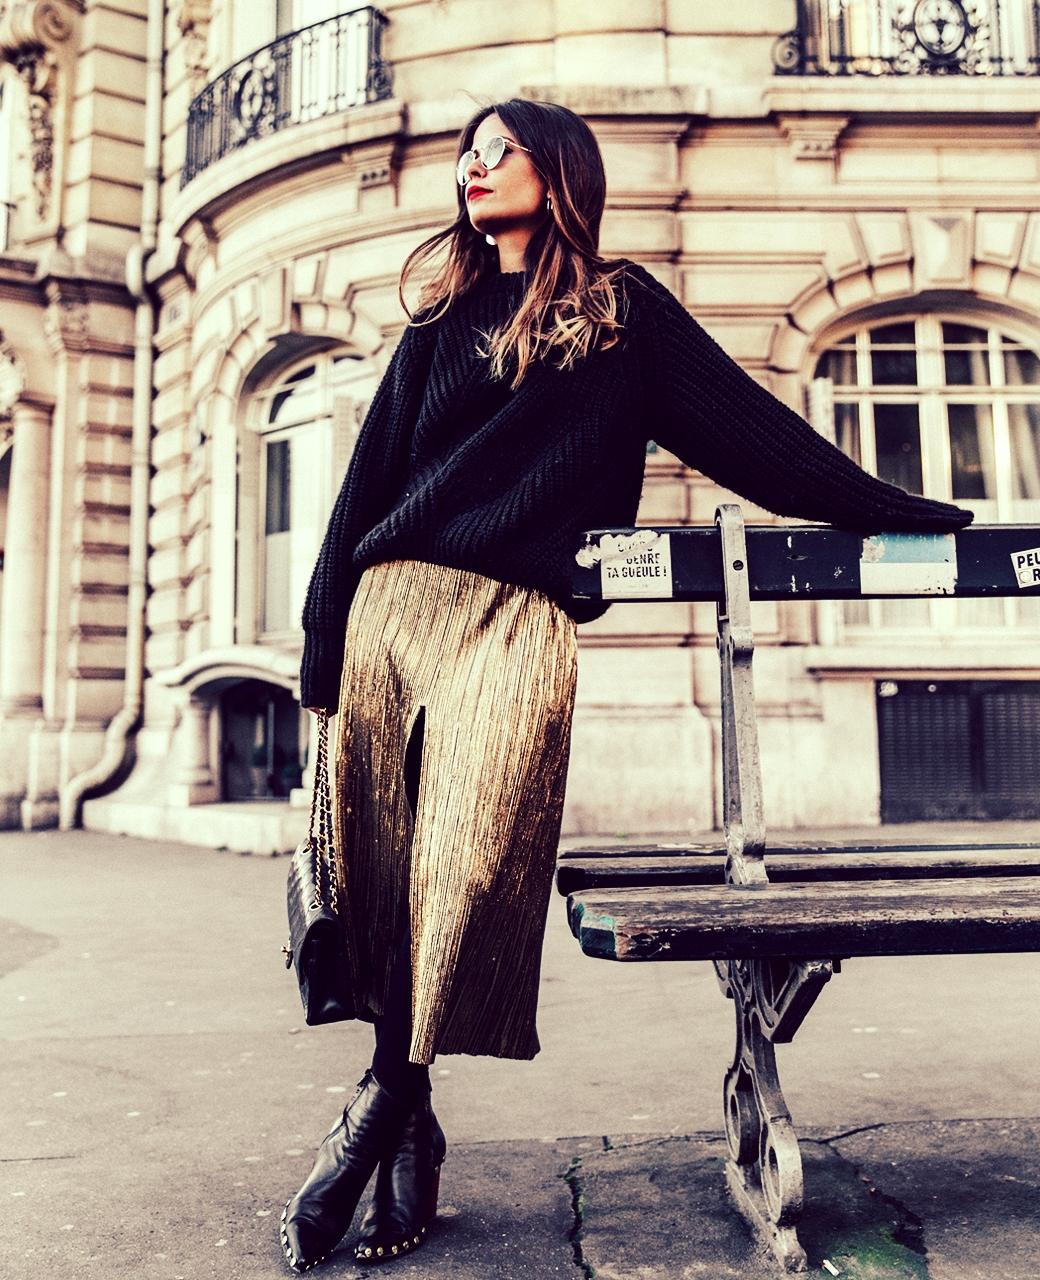 Metallic_Dress-Gold_Skirt-Pleated-Celine_Boots-Outfit-Paris-PFW-Street_Style-16.jpg